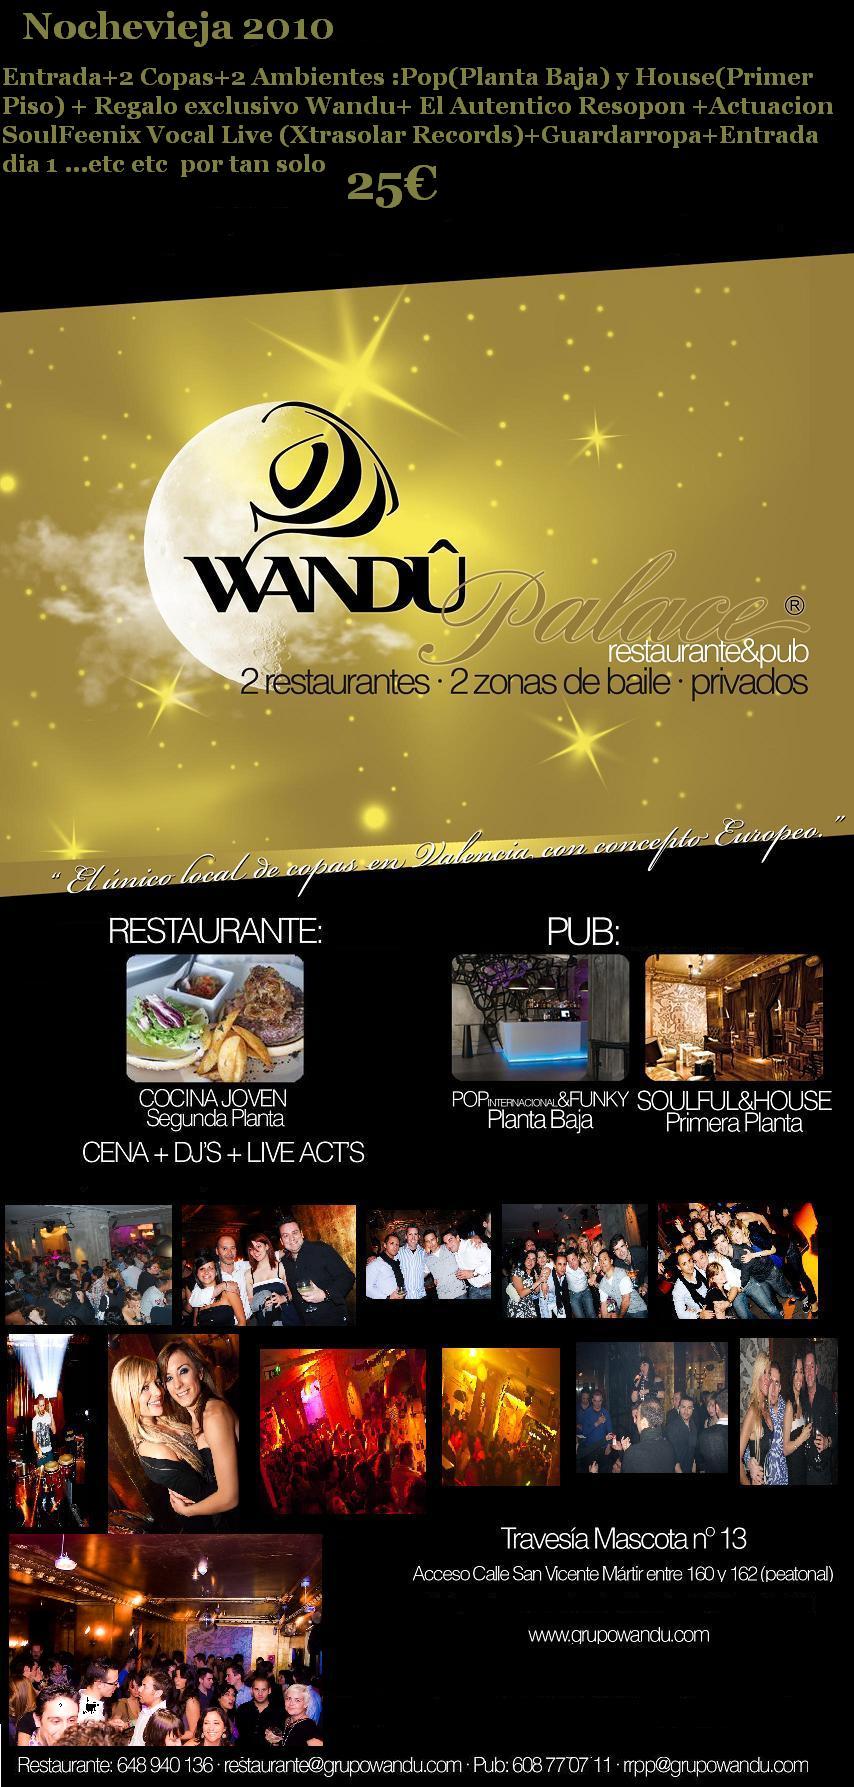 Nochevieja 2010 en wandu palace fiestas noche - Restaurantes valencia nochevieja ...